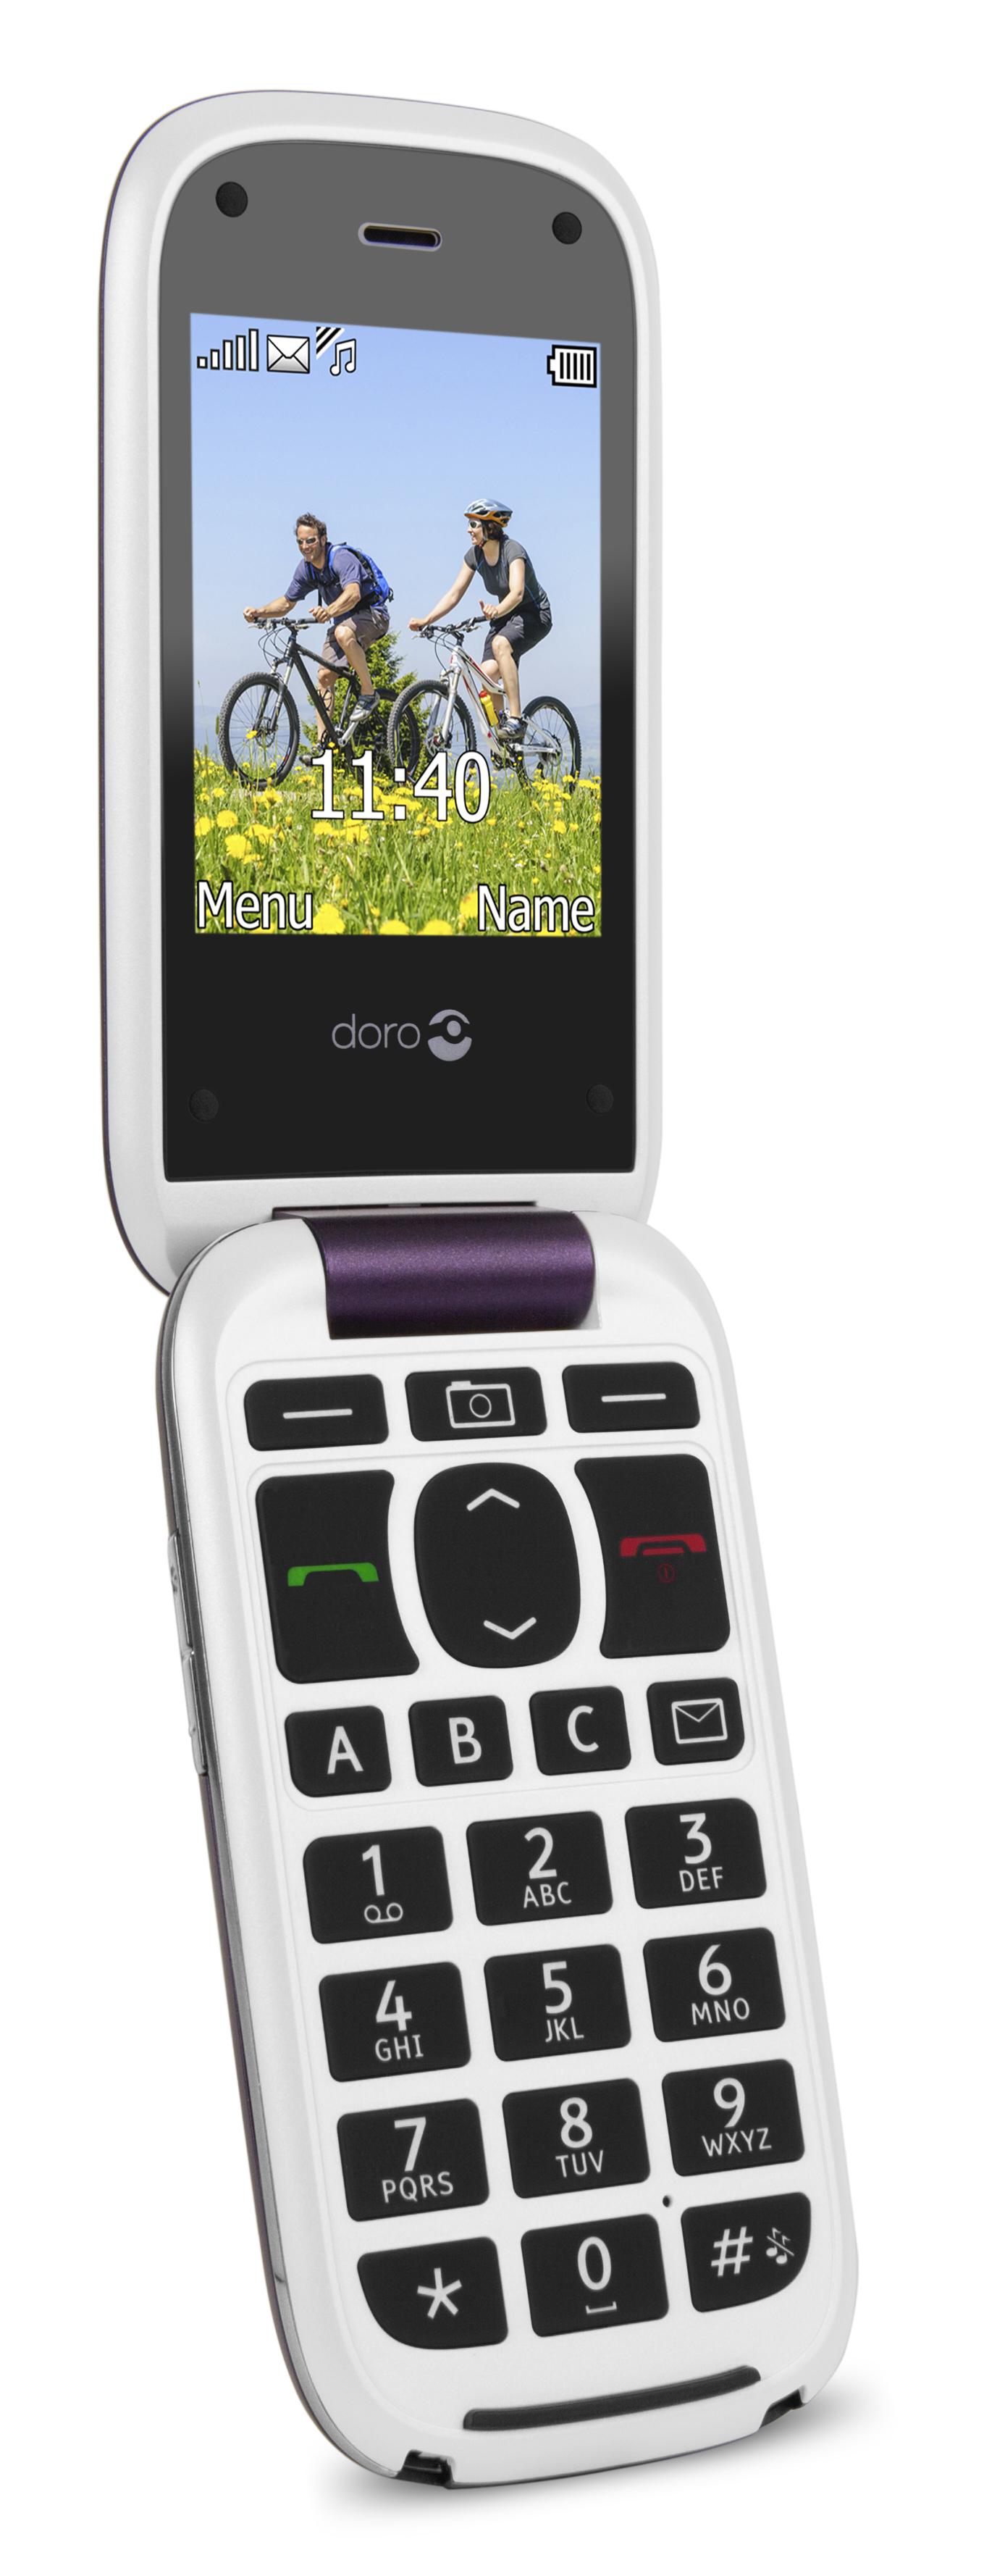 Destockage doro matra doro 613 aubergine blanc pas cher - Telephone portable doro pas cher ...